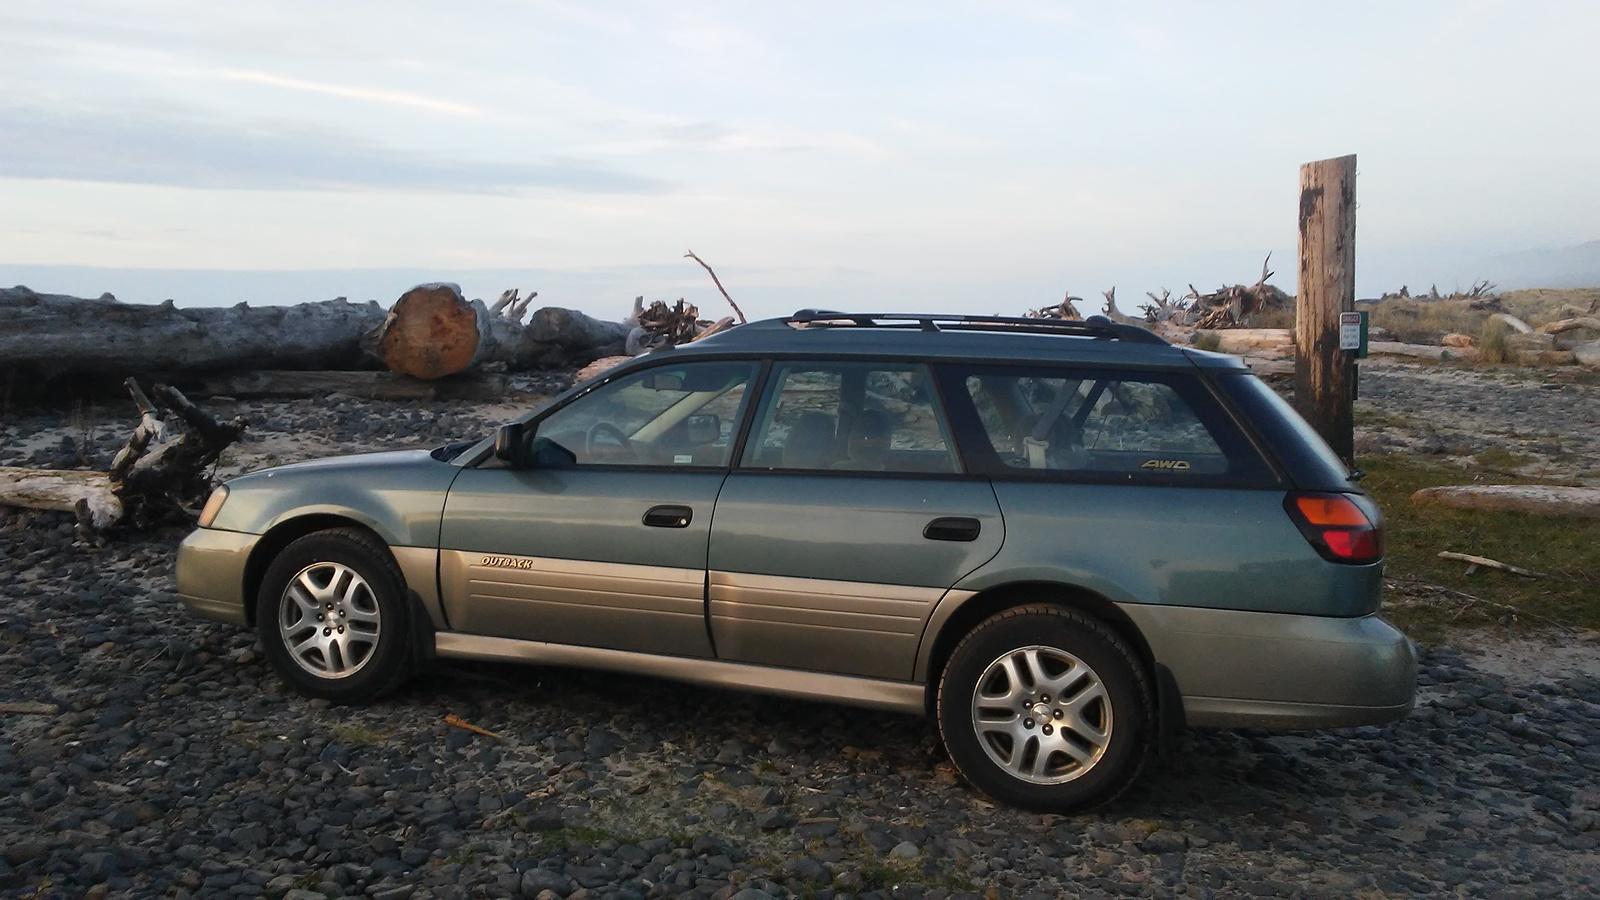 Subaru Outback Questions - engine swap?? - CarGurus